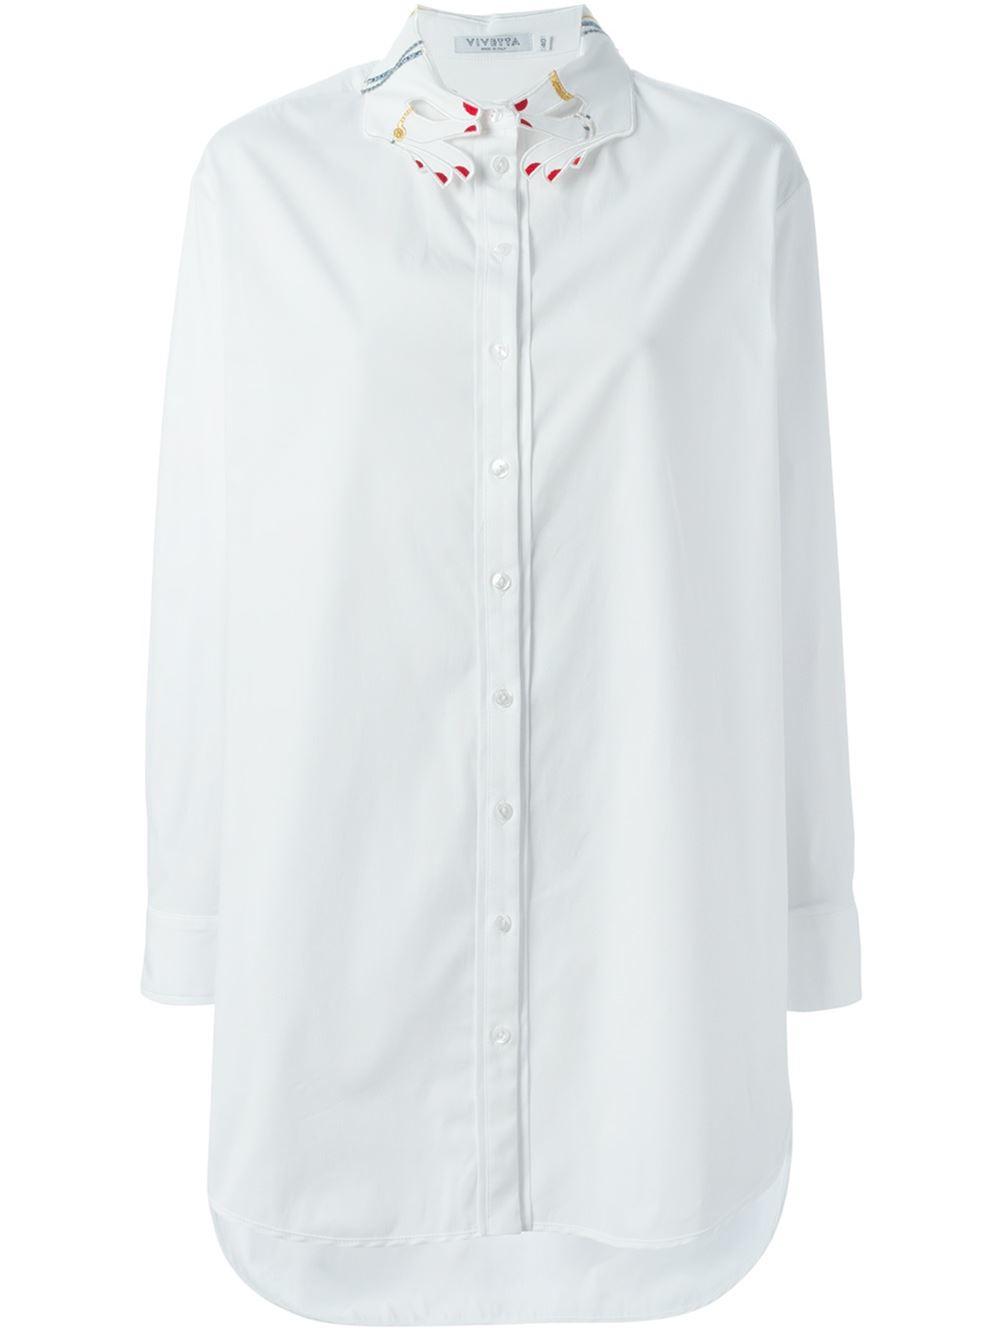 Lyst Vivetta Hands Embroidered Collar Shirt In White